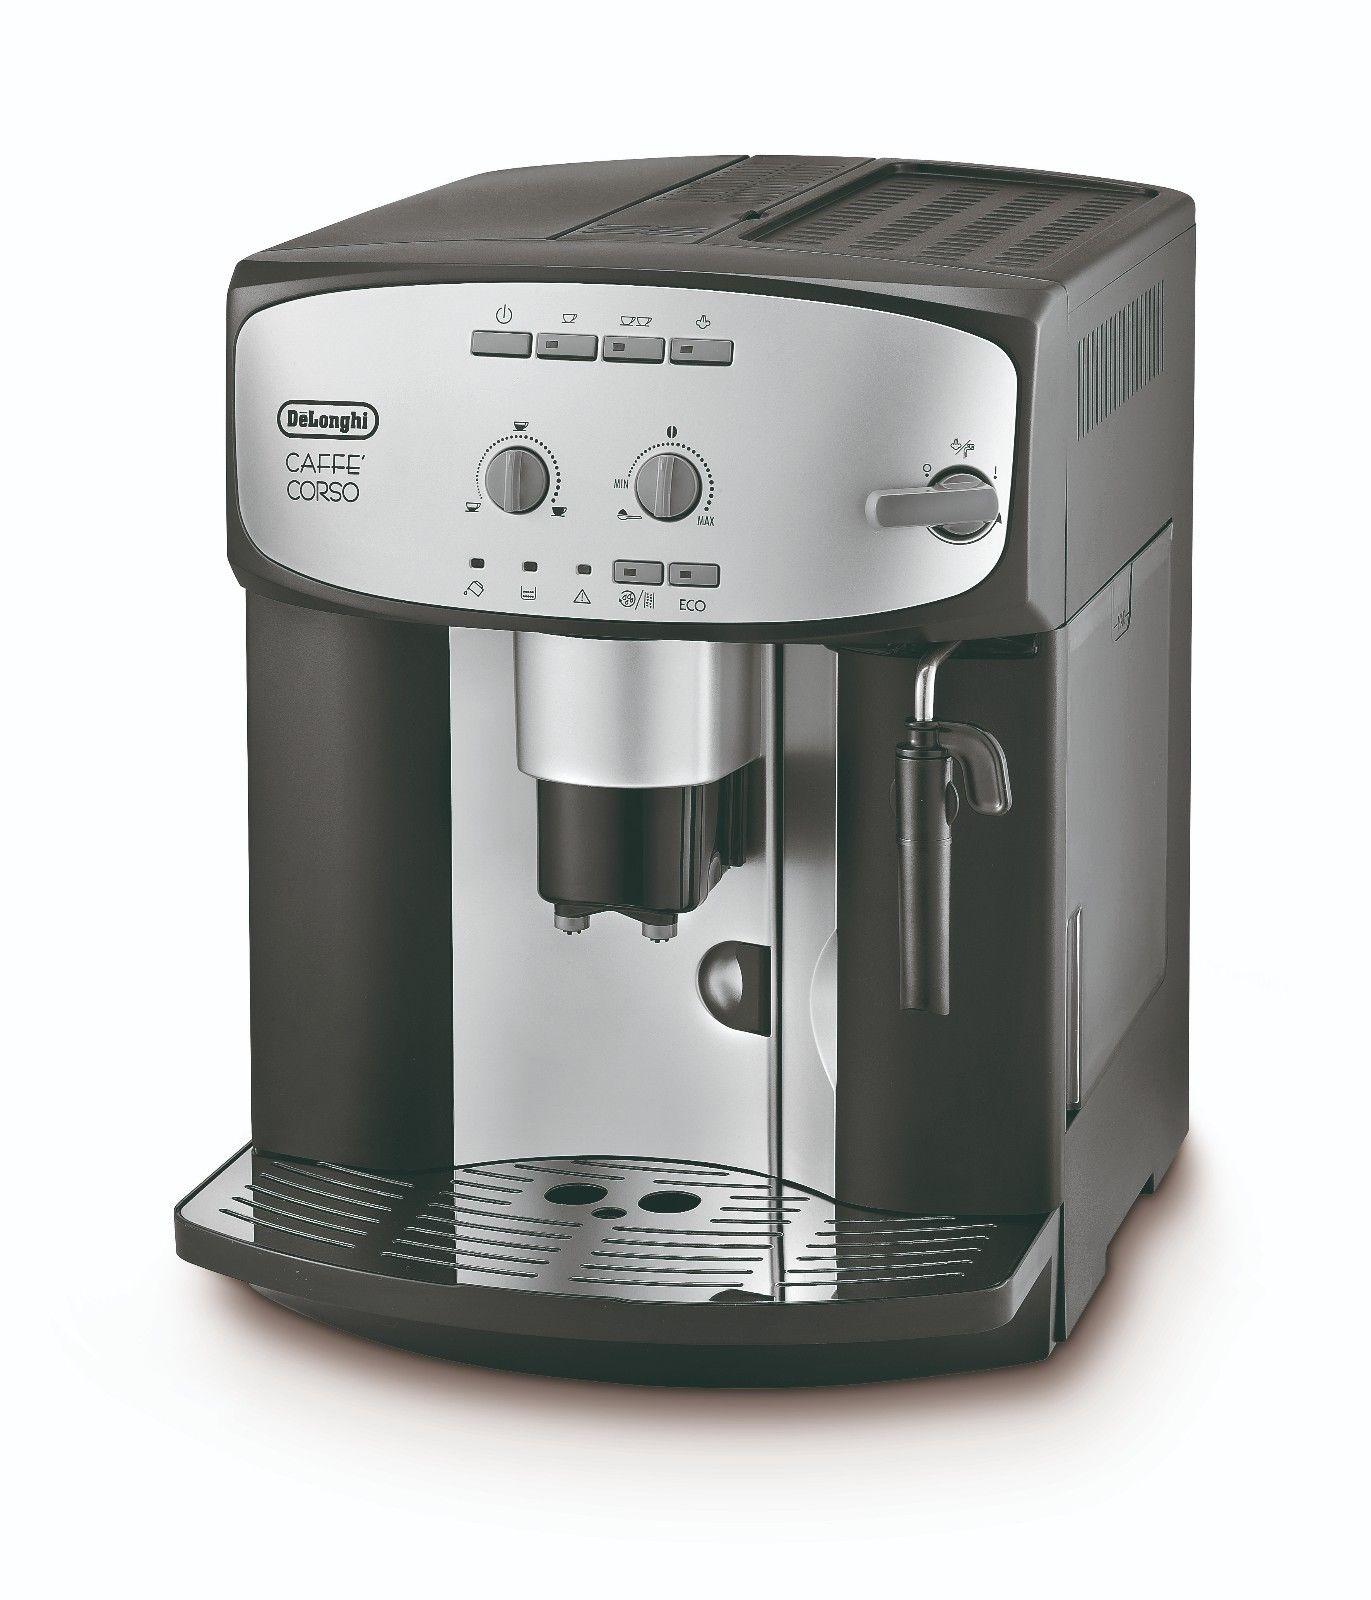 De'Longhi Cafe Corso ESAM2800 Bean to Cup Coffee Machine - Refurb £134.39 / De'Longhi ESAM2600 Refurb £134.39 w/code @ delonghiuk ebay